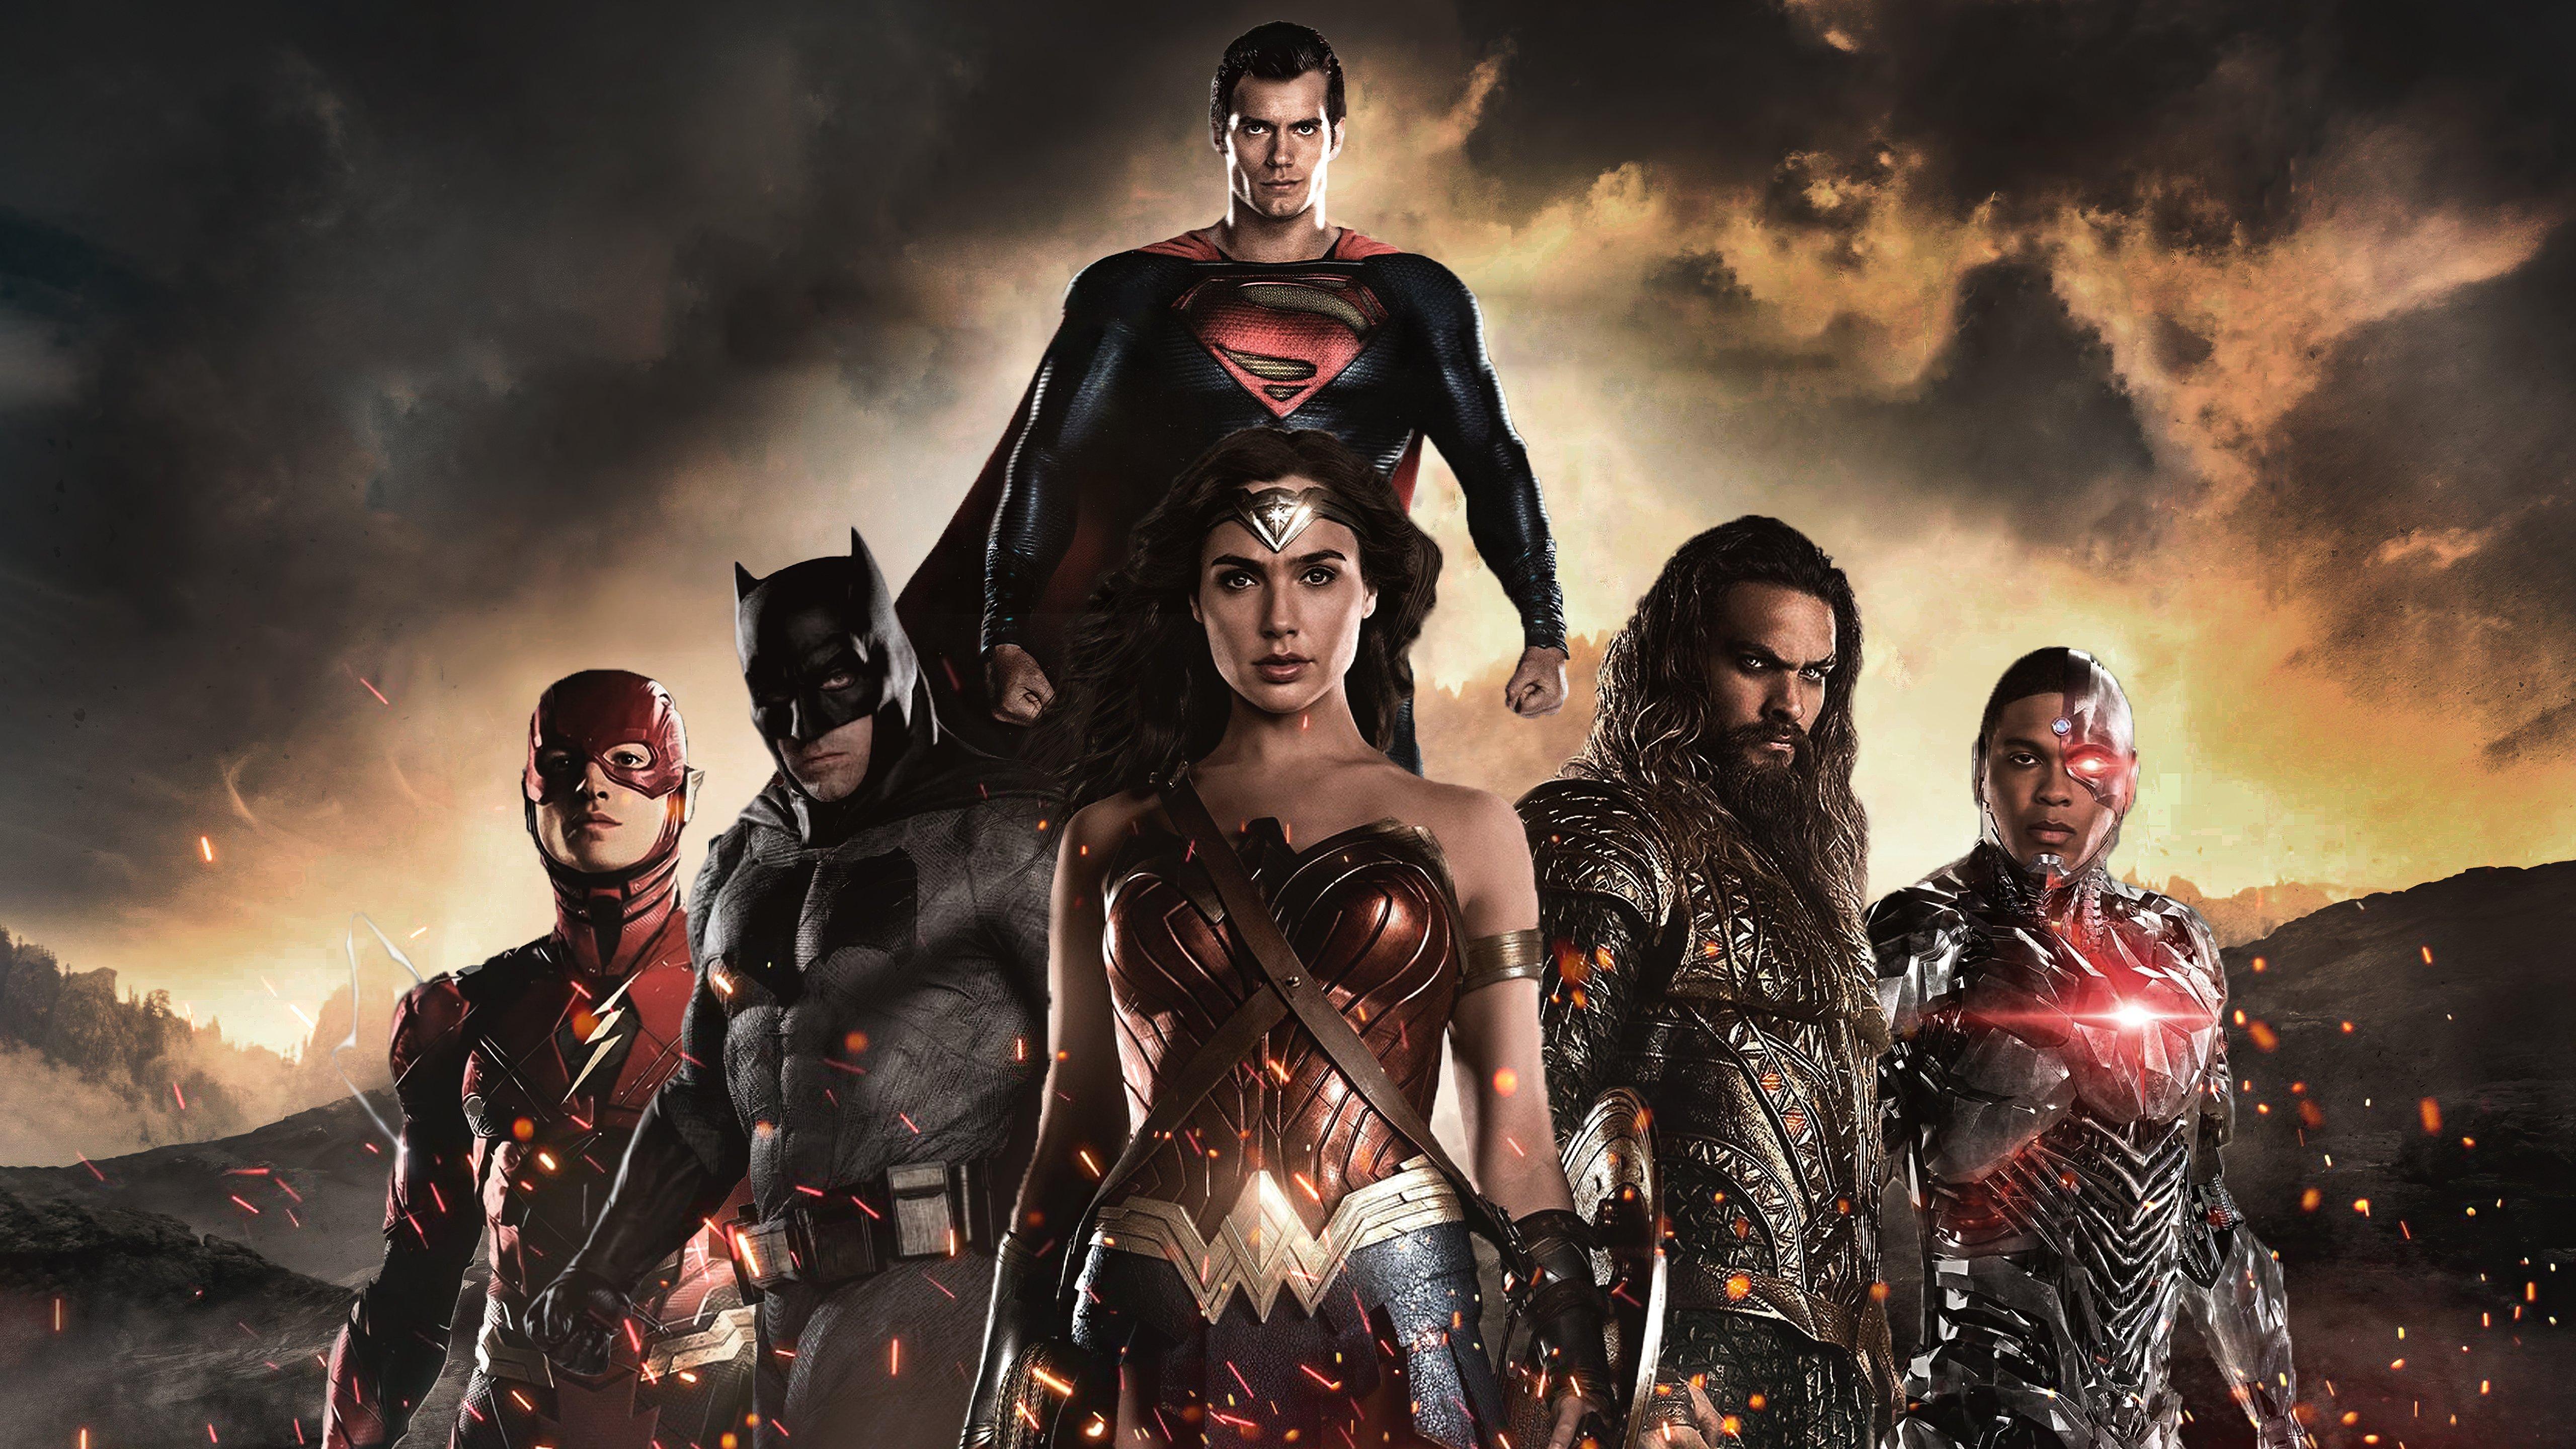 Fondos de pantalla Héroes de la Liga de la Justicia